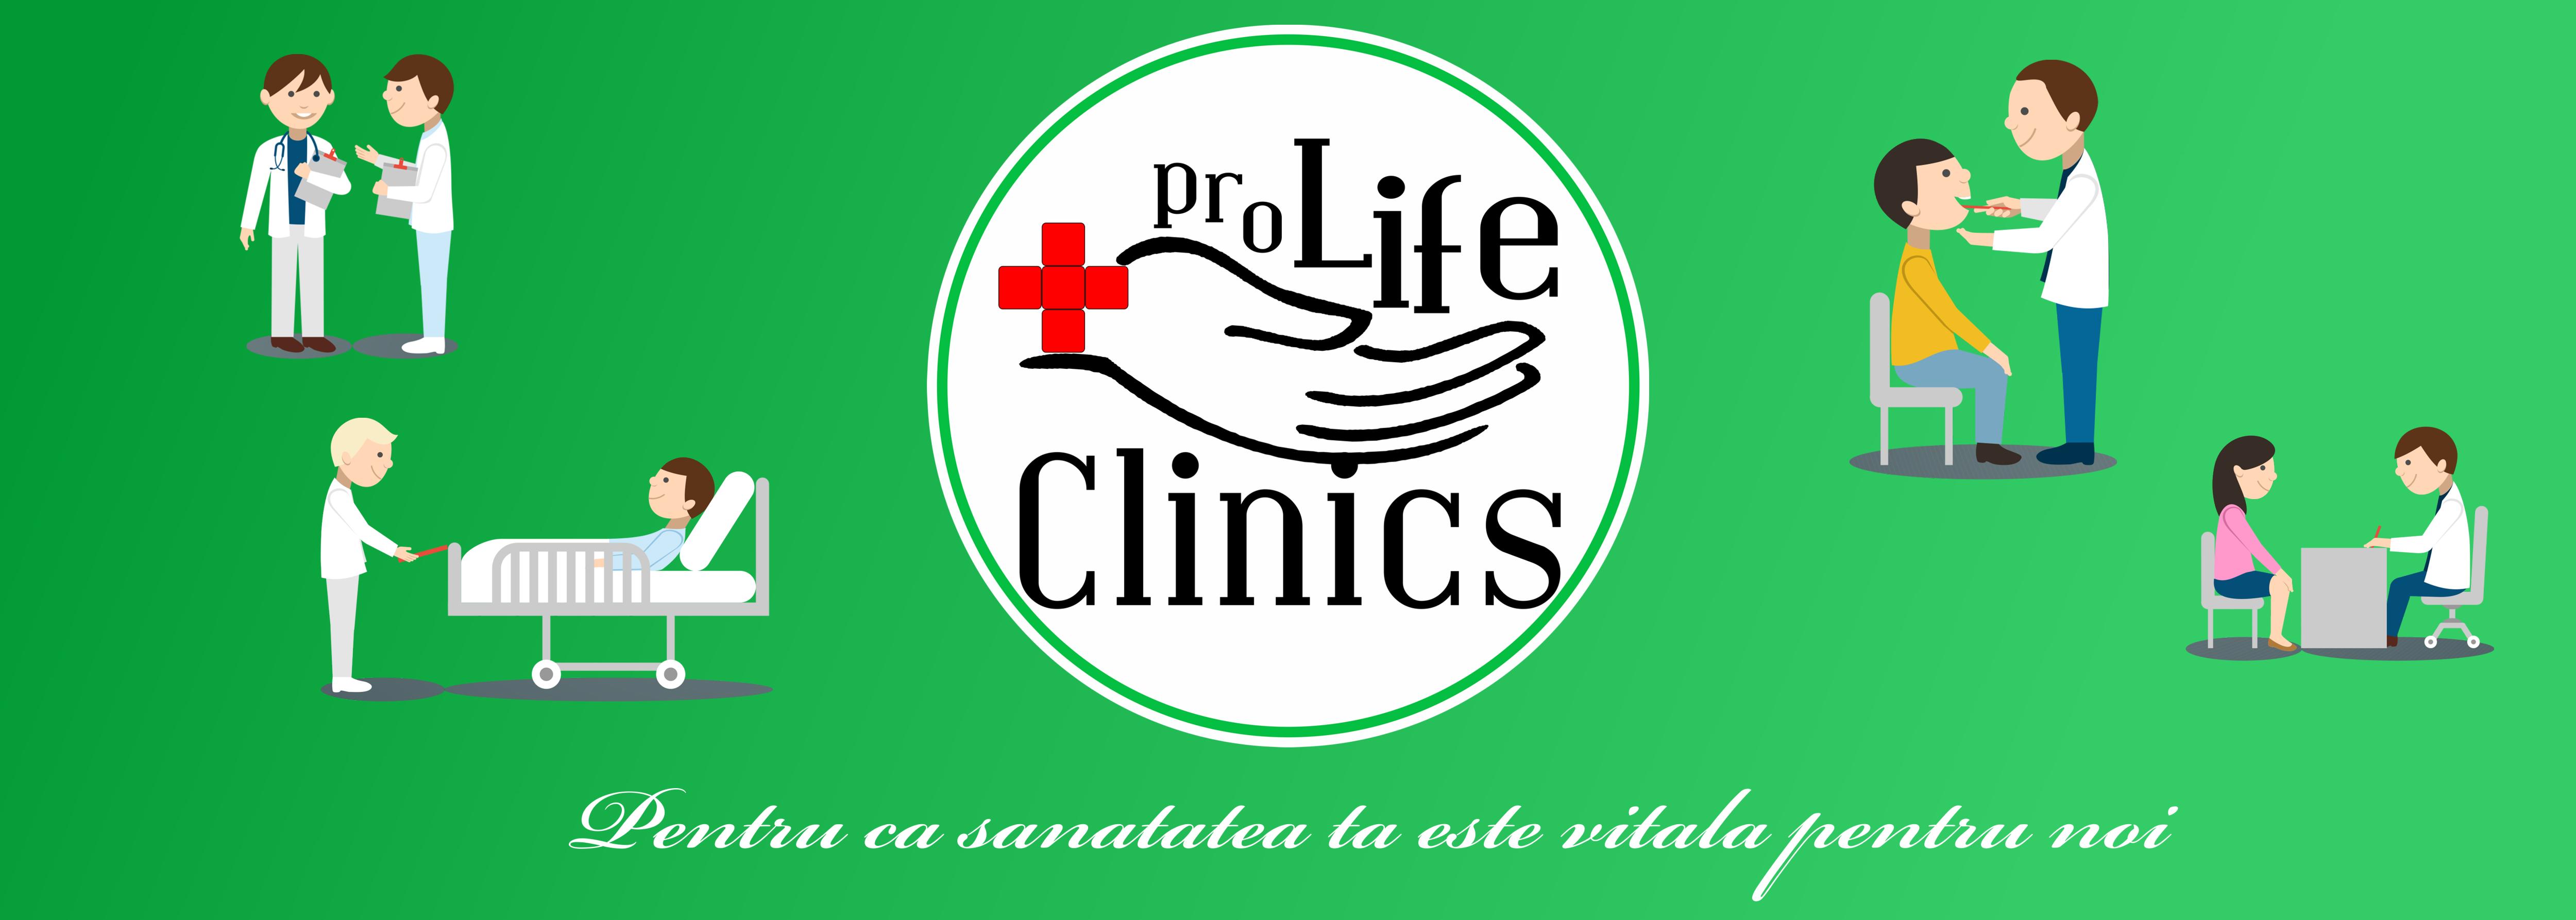 Pro Life Clinics